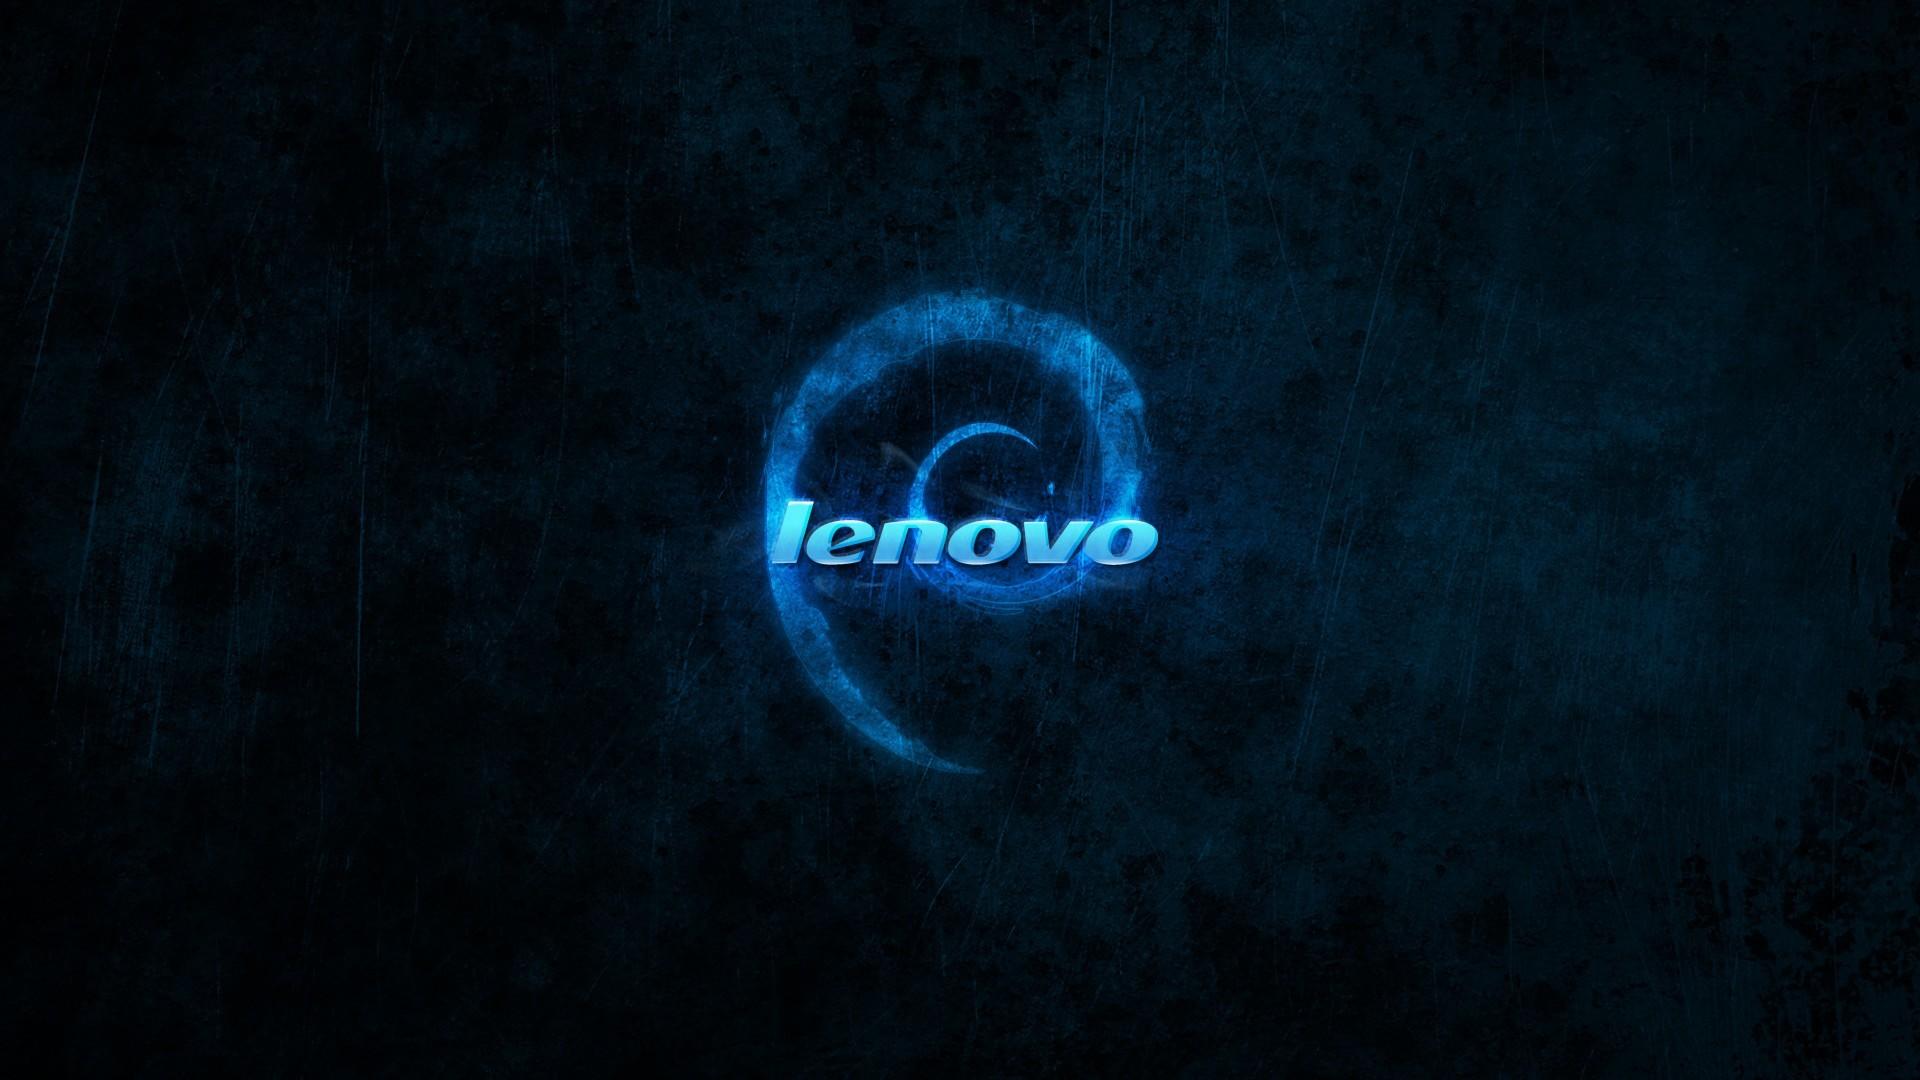 Lenovo Wallpaper 1920x1080 67 images 1920x1080